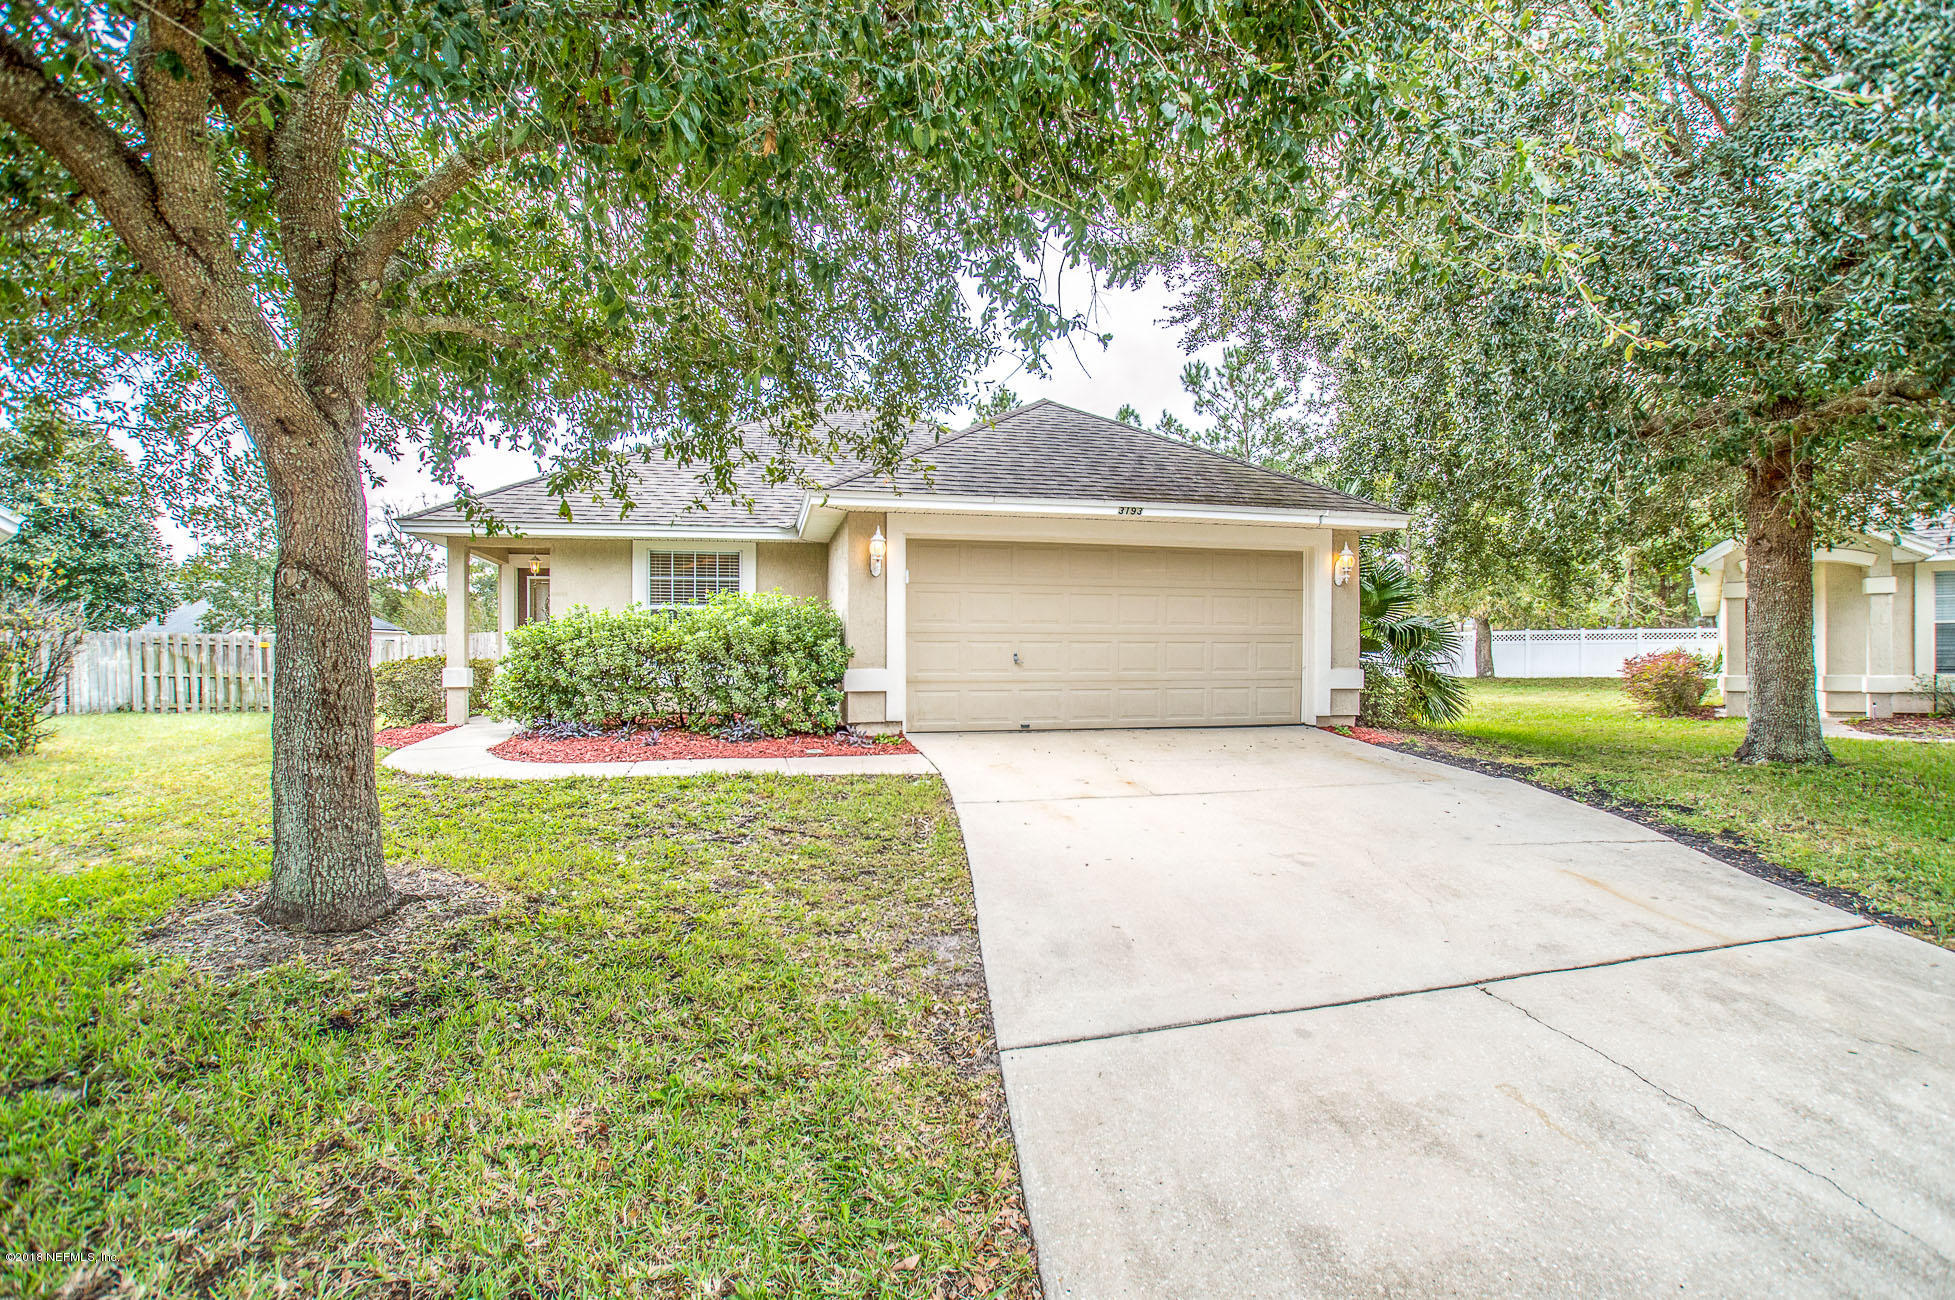 3193 LITCHFIELD, ORANGE PARK, FLORIDA 32065, 4 Bedrooms Bedrooms, ,2 BathroomsBathrooms,Residential - single family,For sale,LITCHFIELD,966042